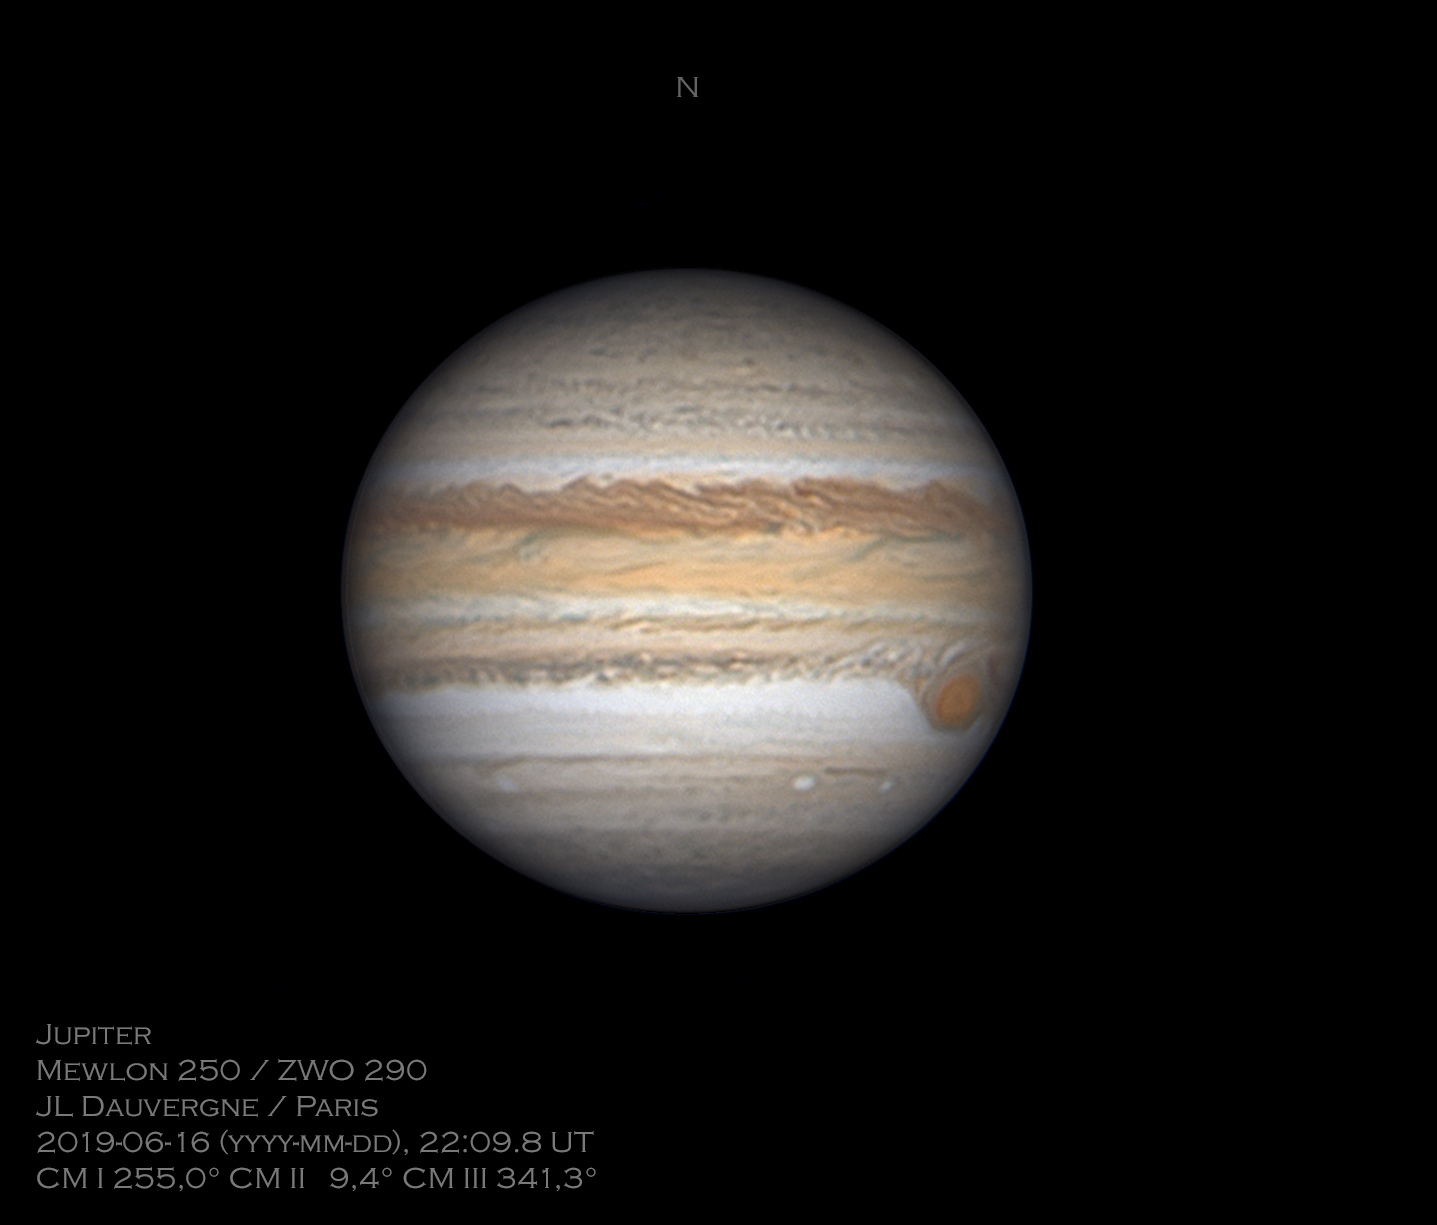 5d13defa7270d_2019-06-16-2209_8-L-Jupiter_ZWOASI290MMMini_lapl5_ap171copie.jpg.f4066af7a7ad5d6ad7731f71c61cb890.jpg